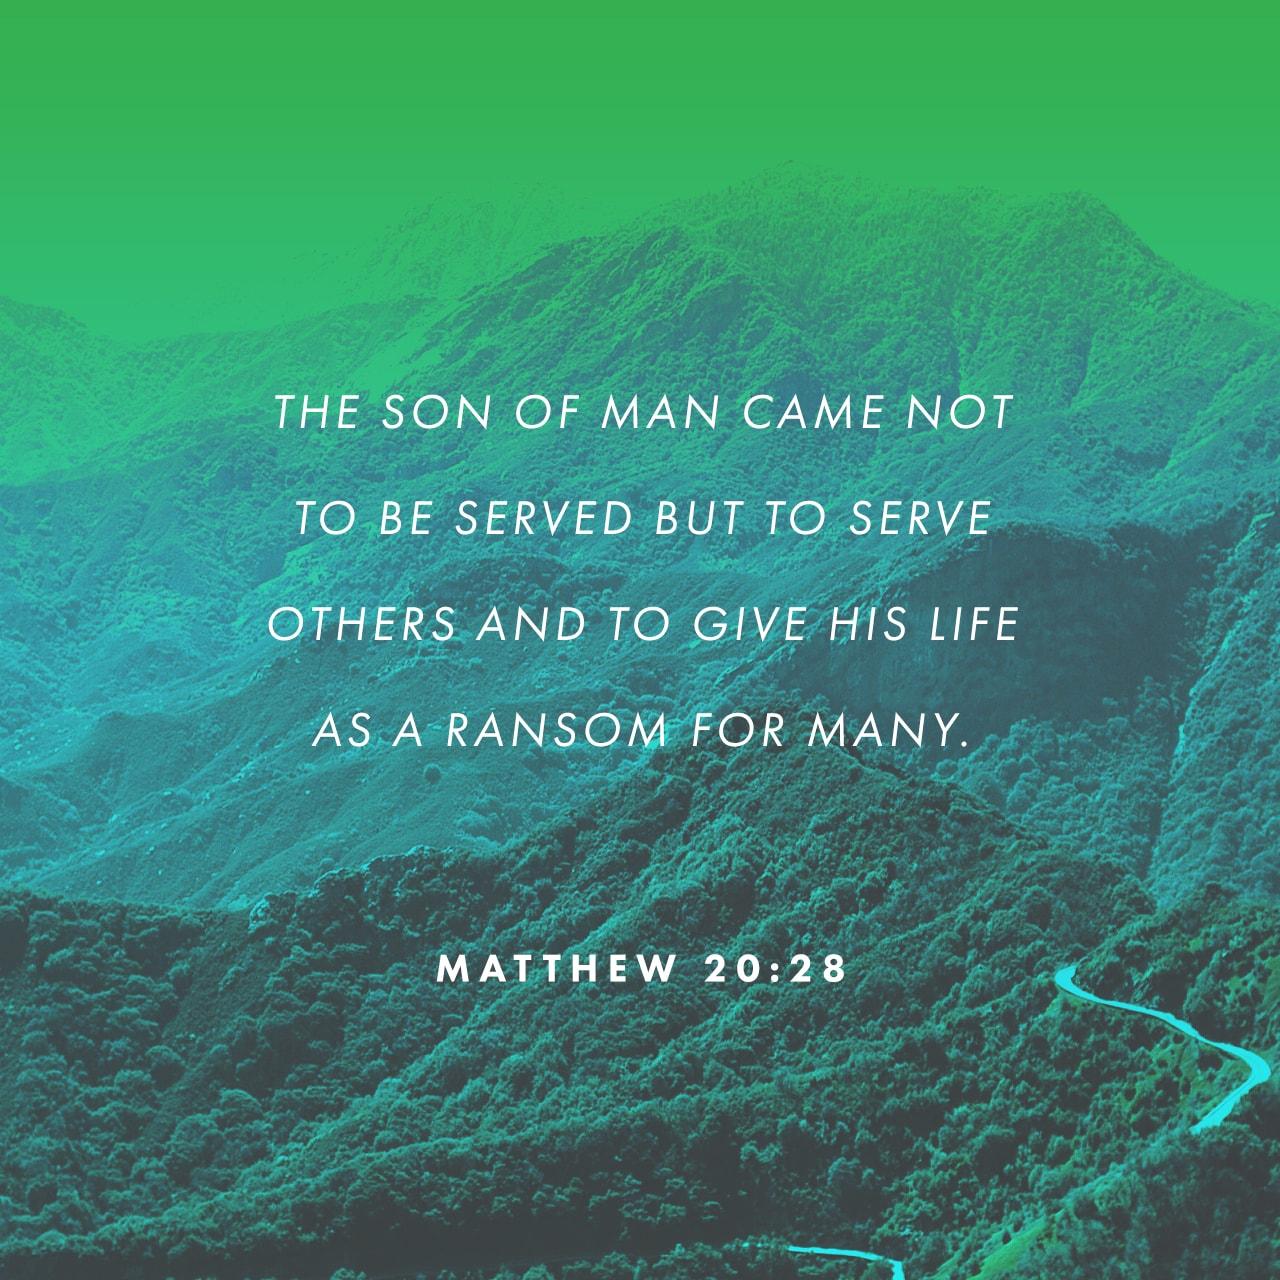 Matthew 20:28 (JPG)